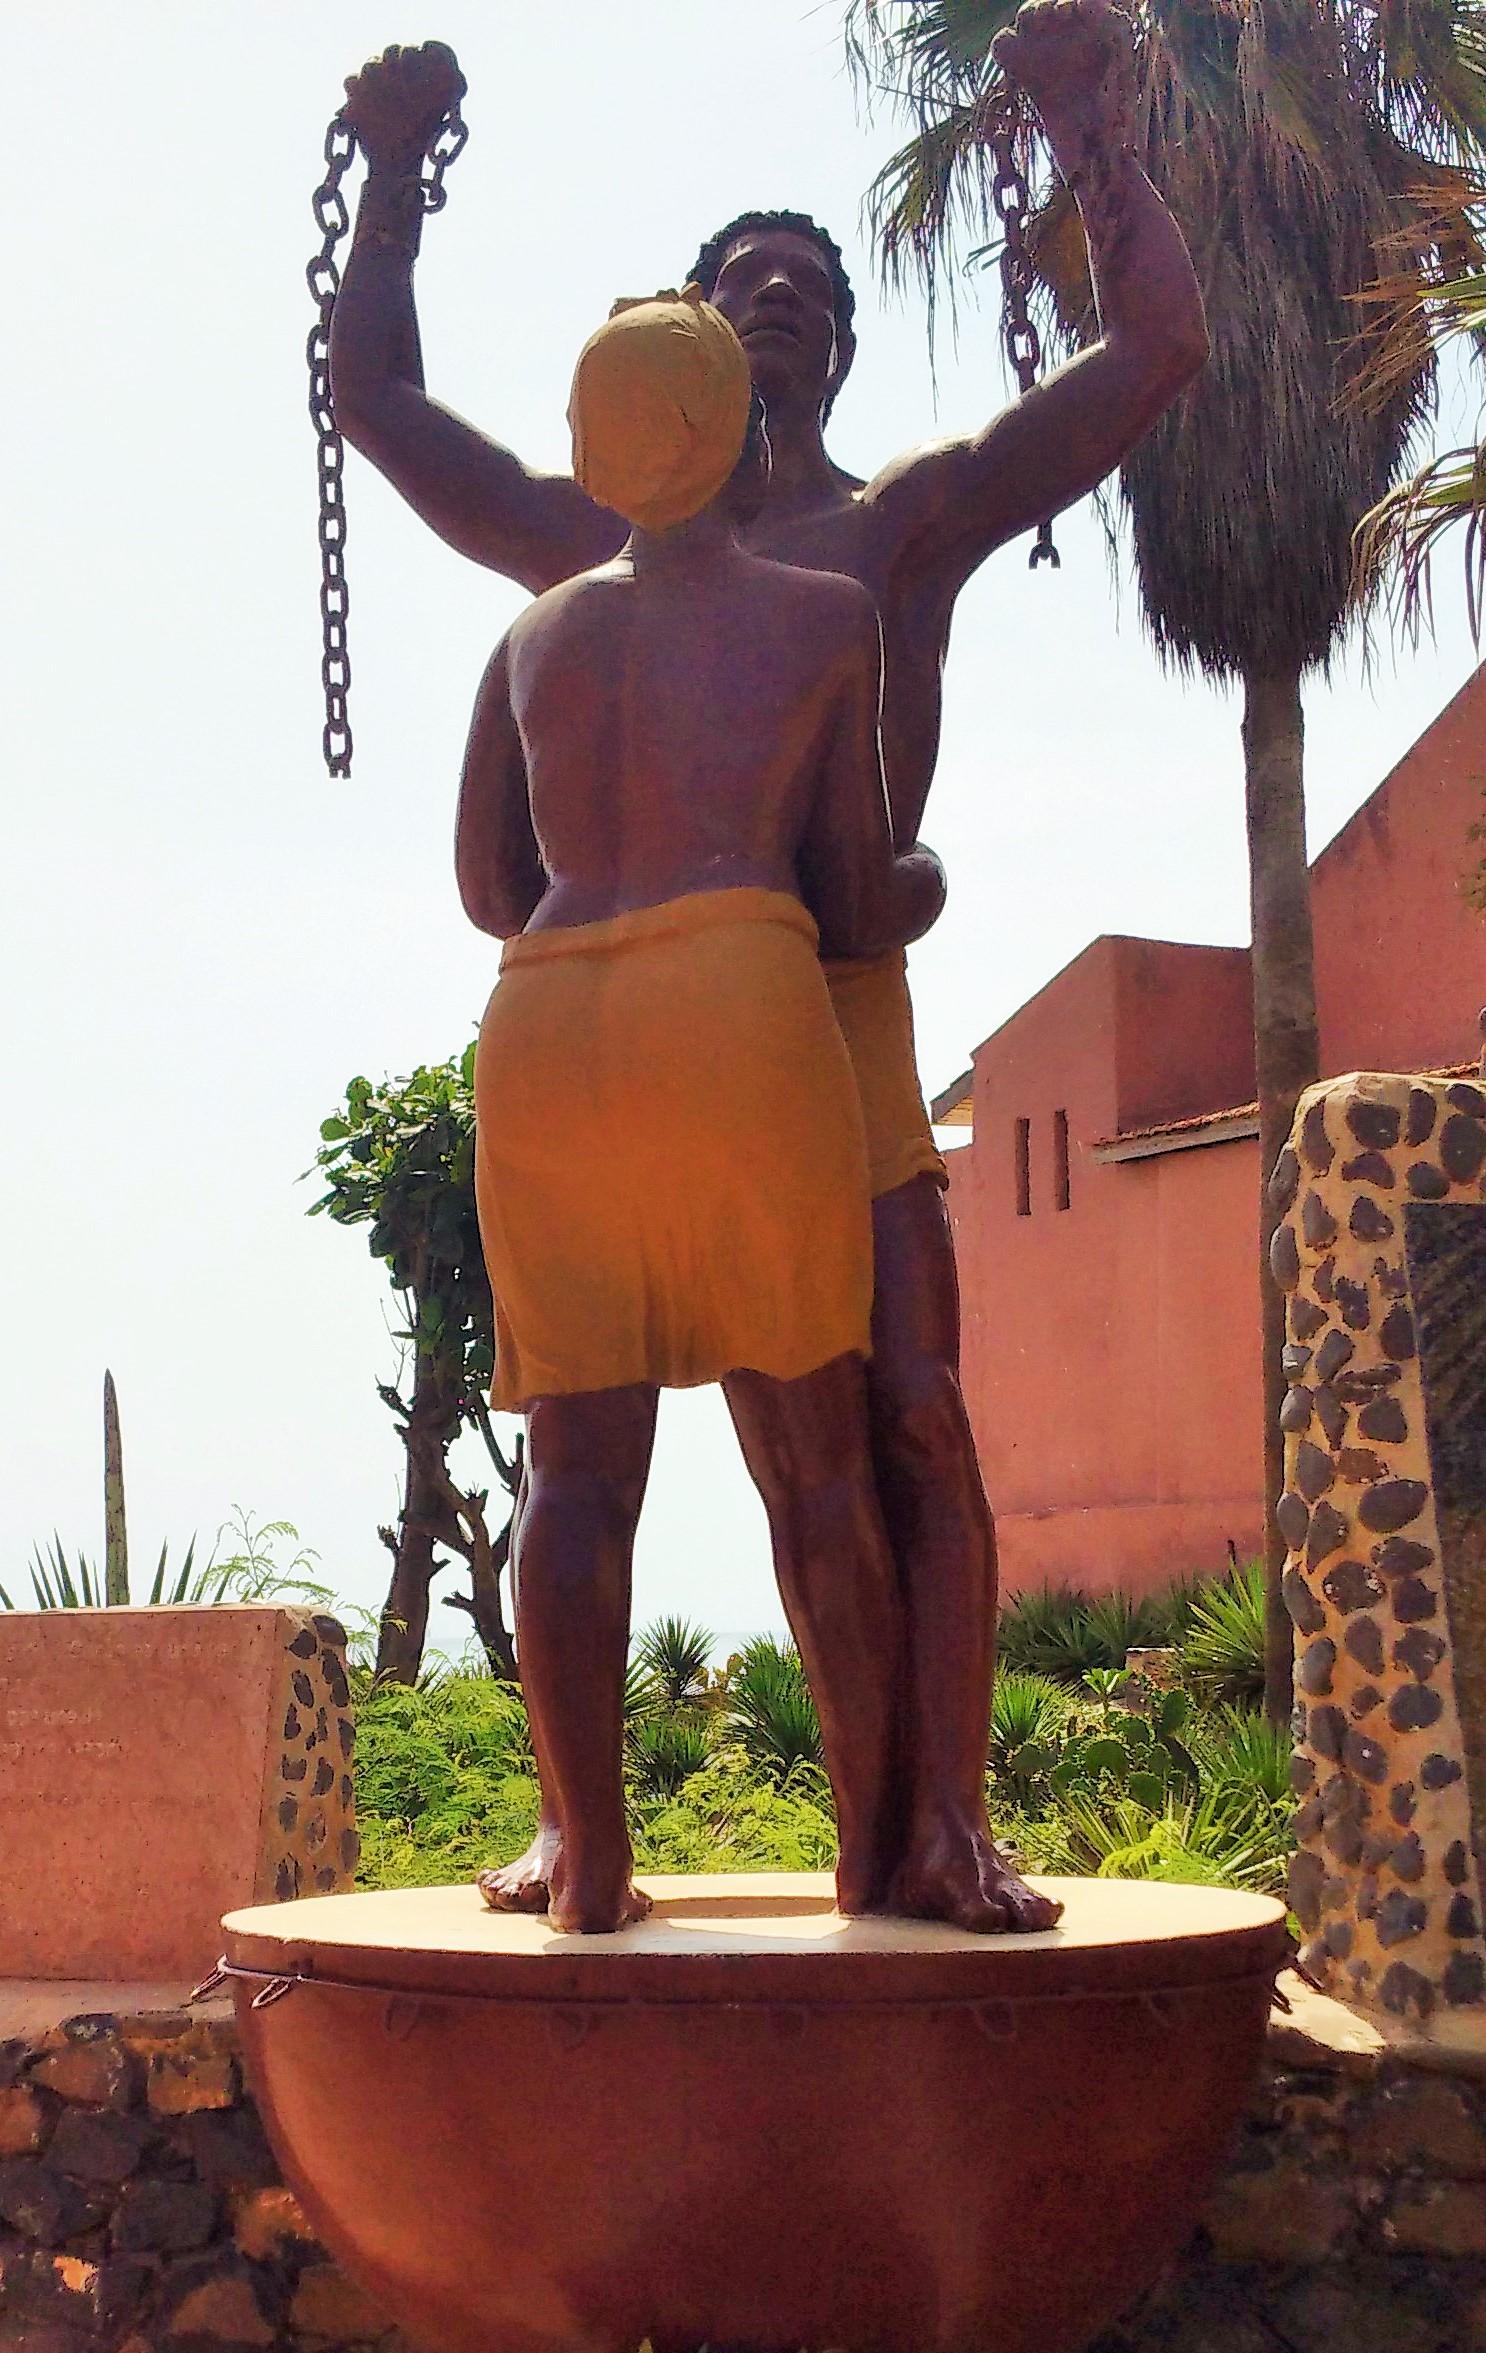 House of slaves | Goree Island